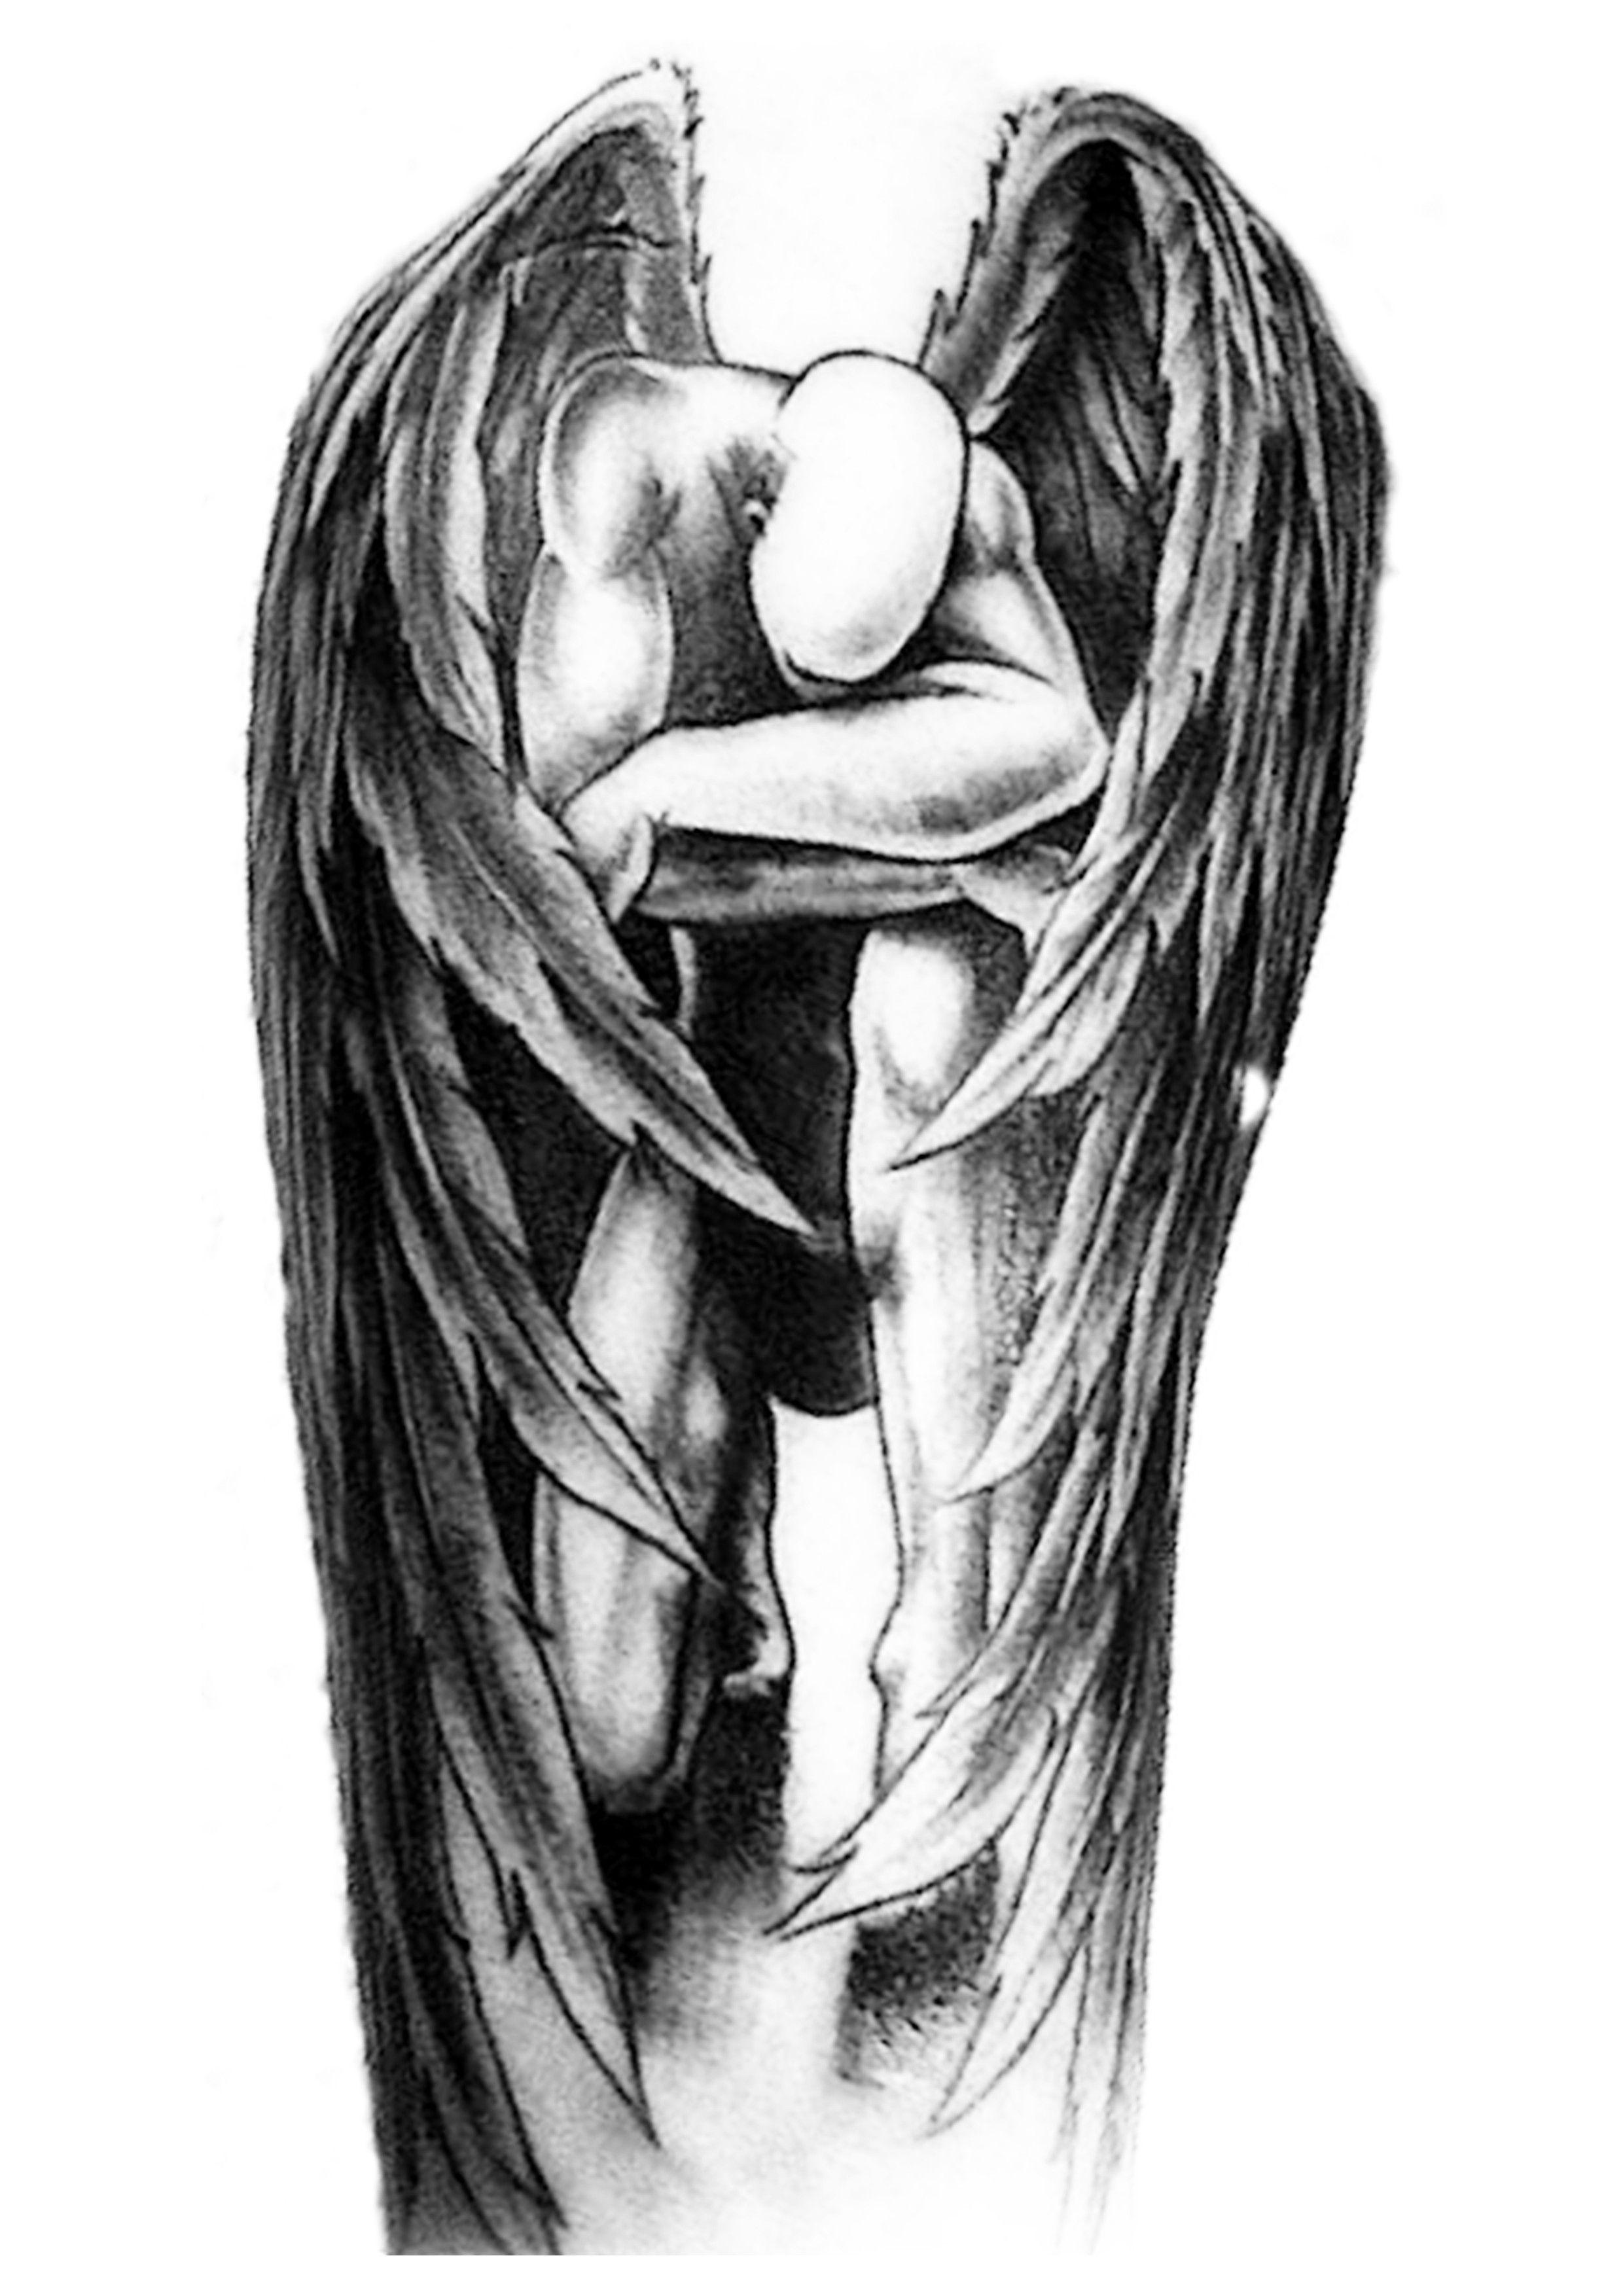 Pin By Albertboom On Tattoo Ideas Fallen Angel Tattoo Archangel Tattoo Angel Tattoo Men